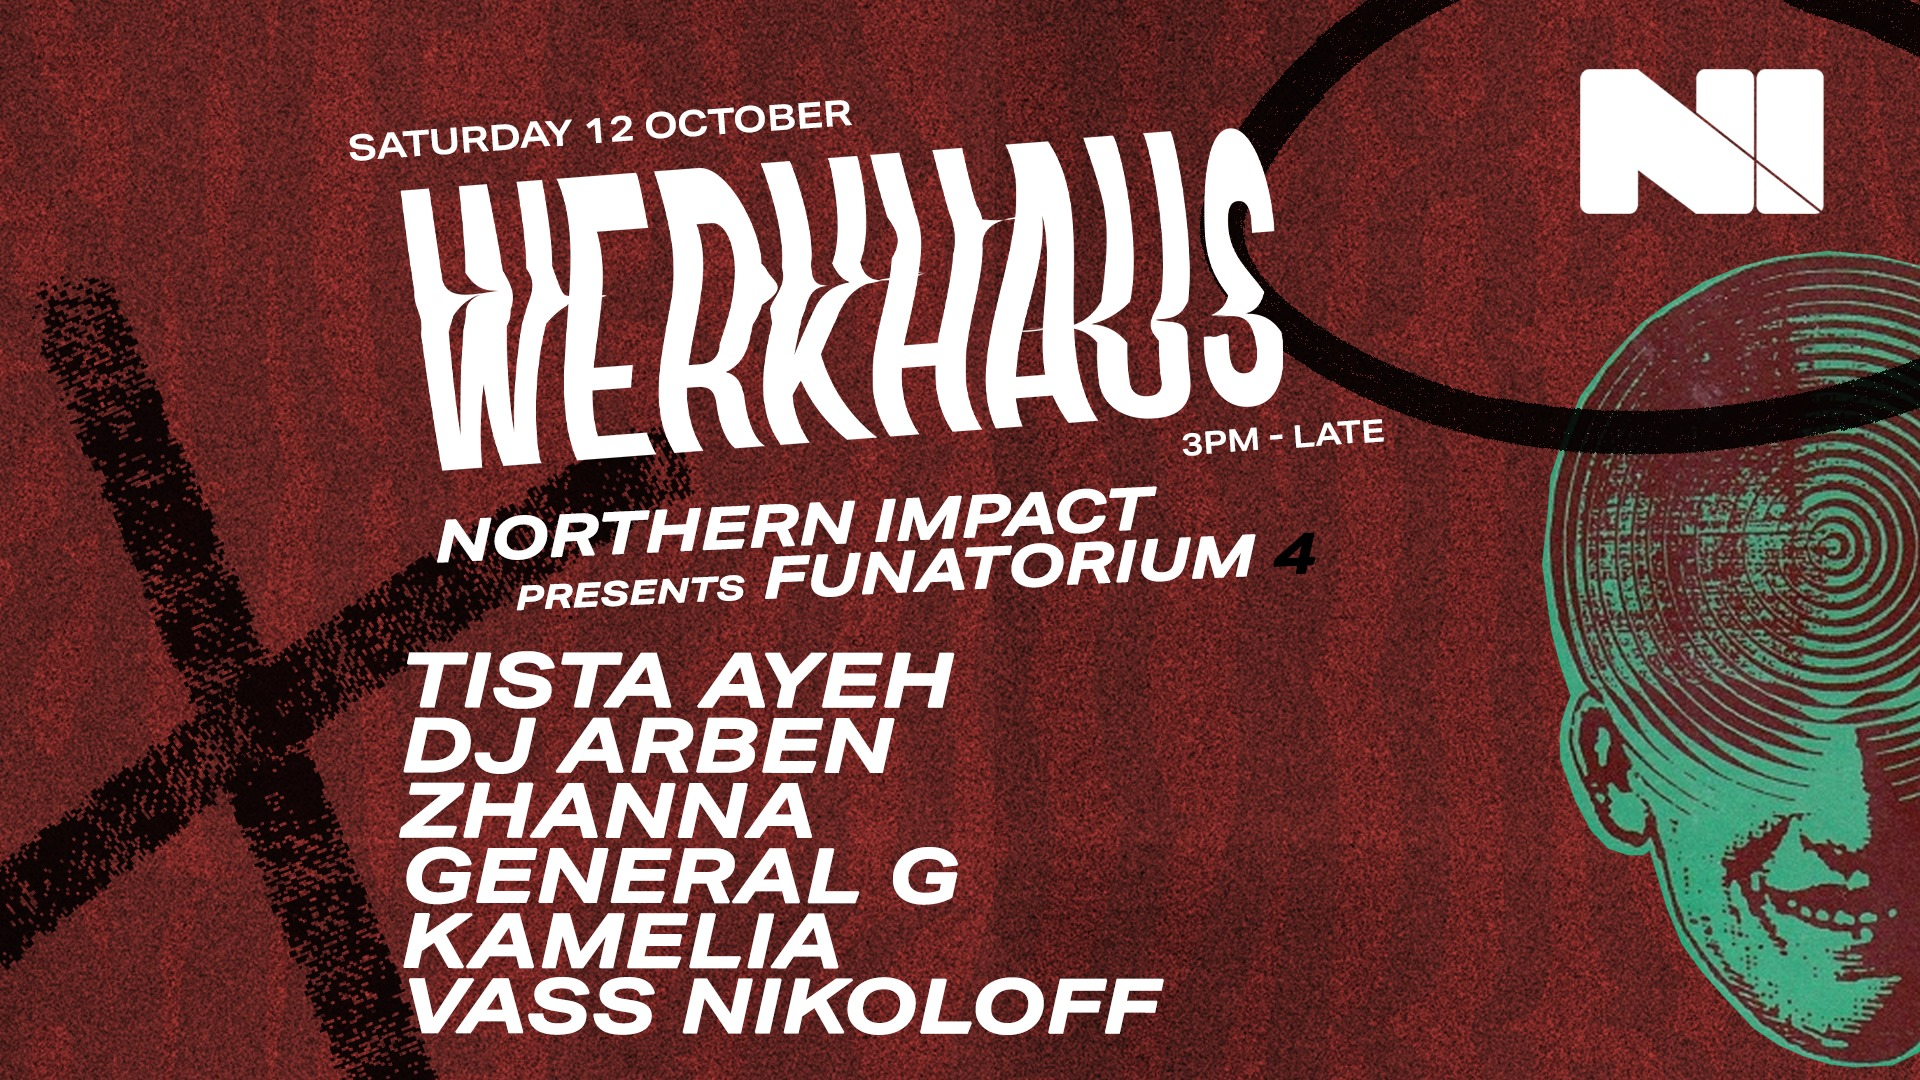 Northern Impact: Funatorium 4